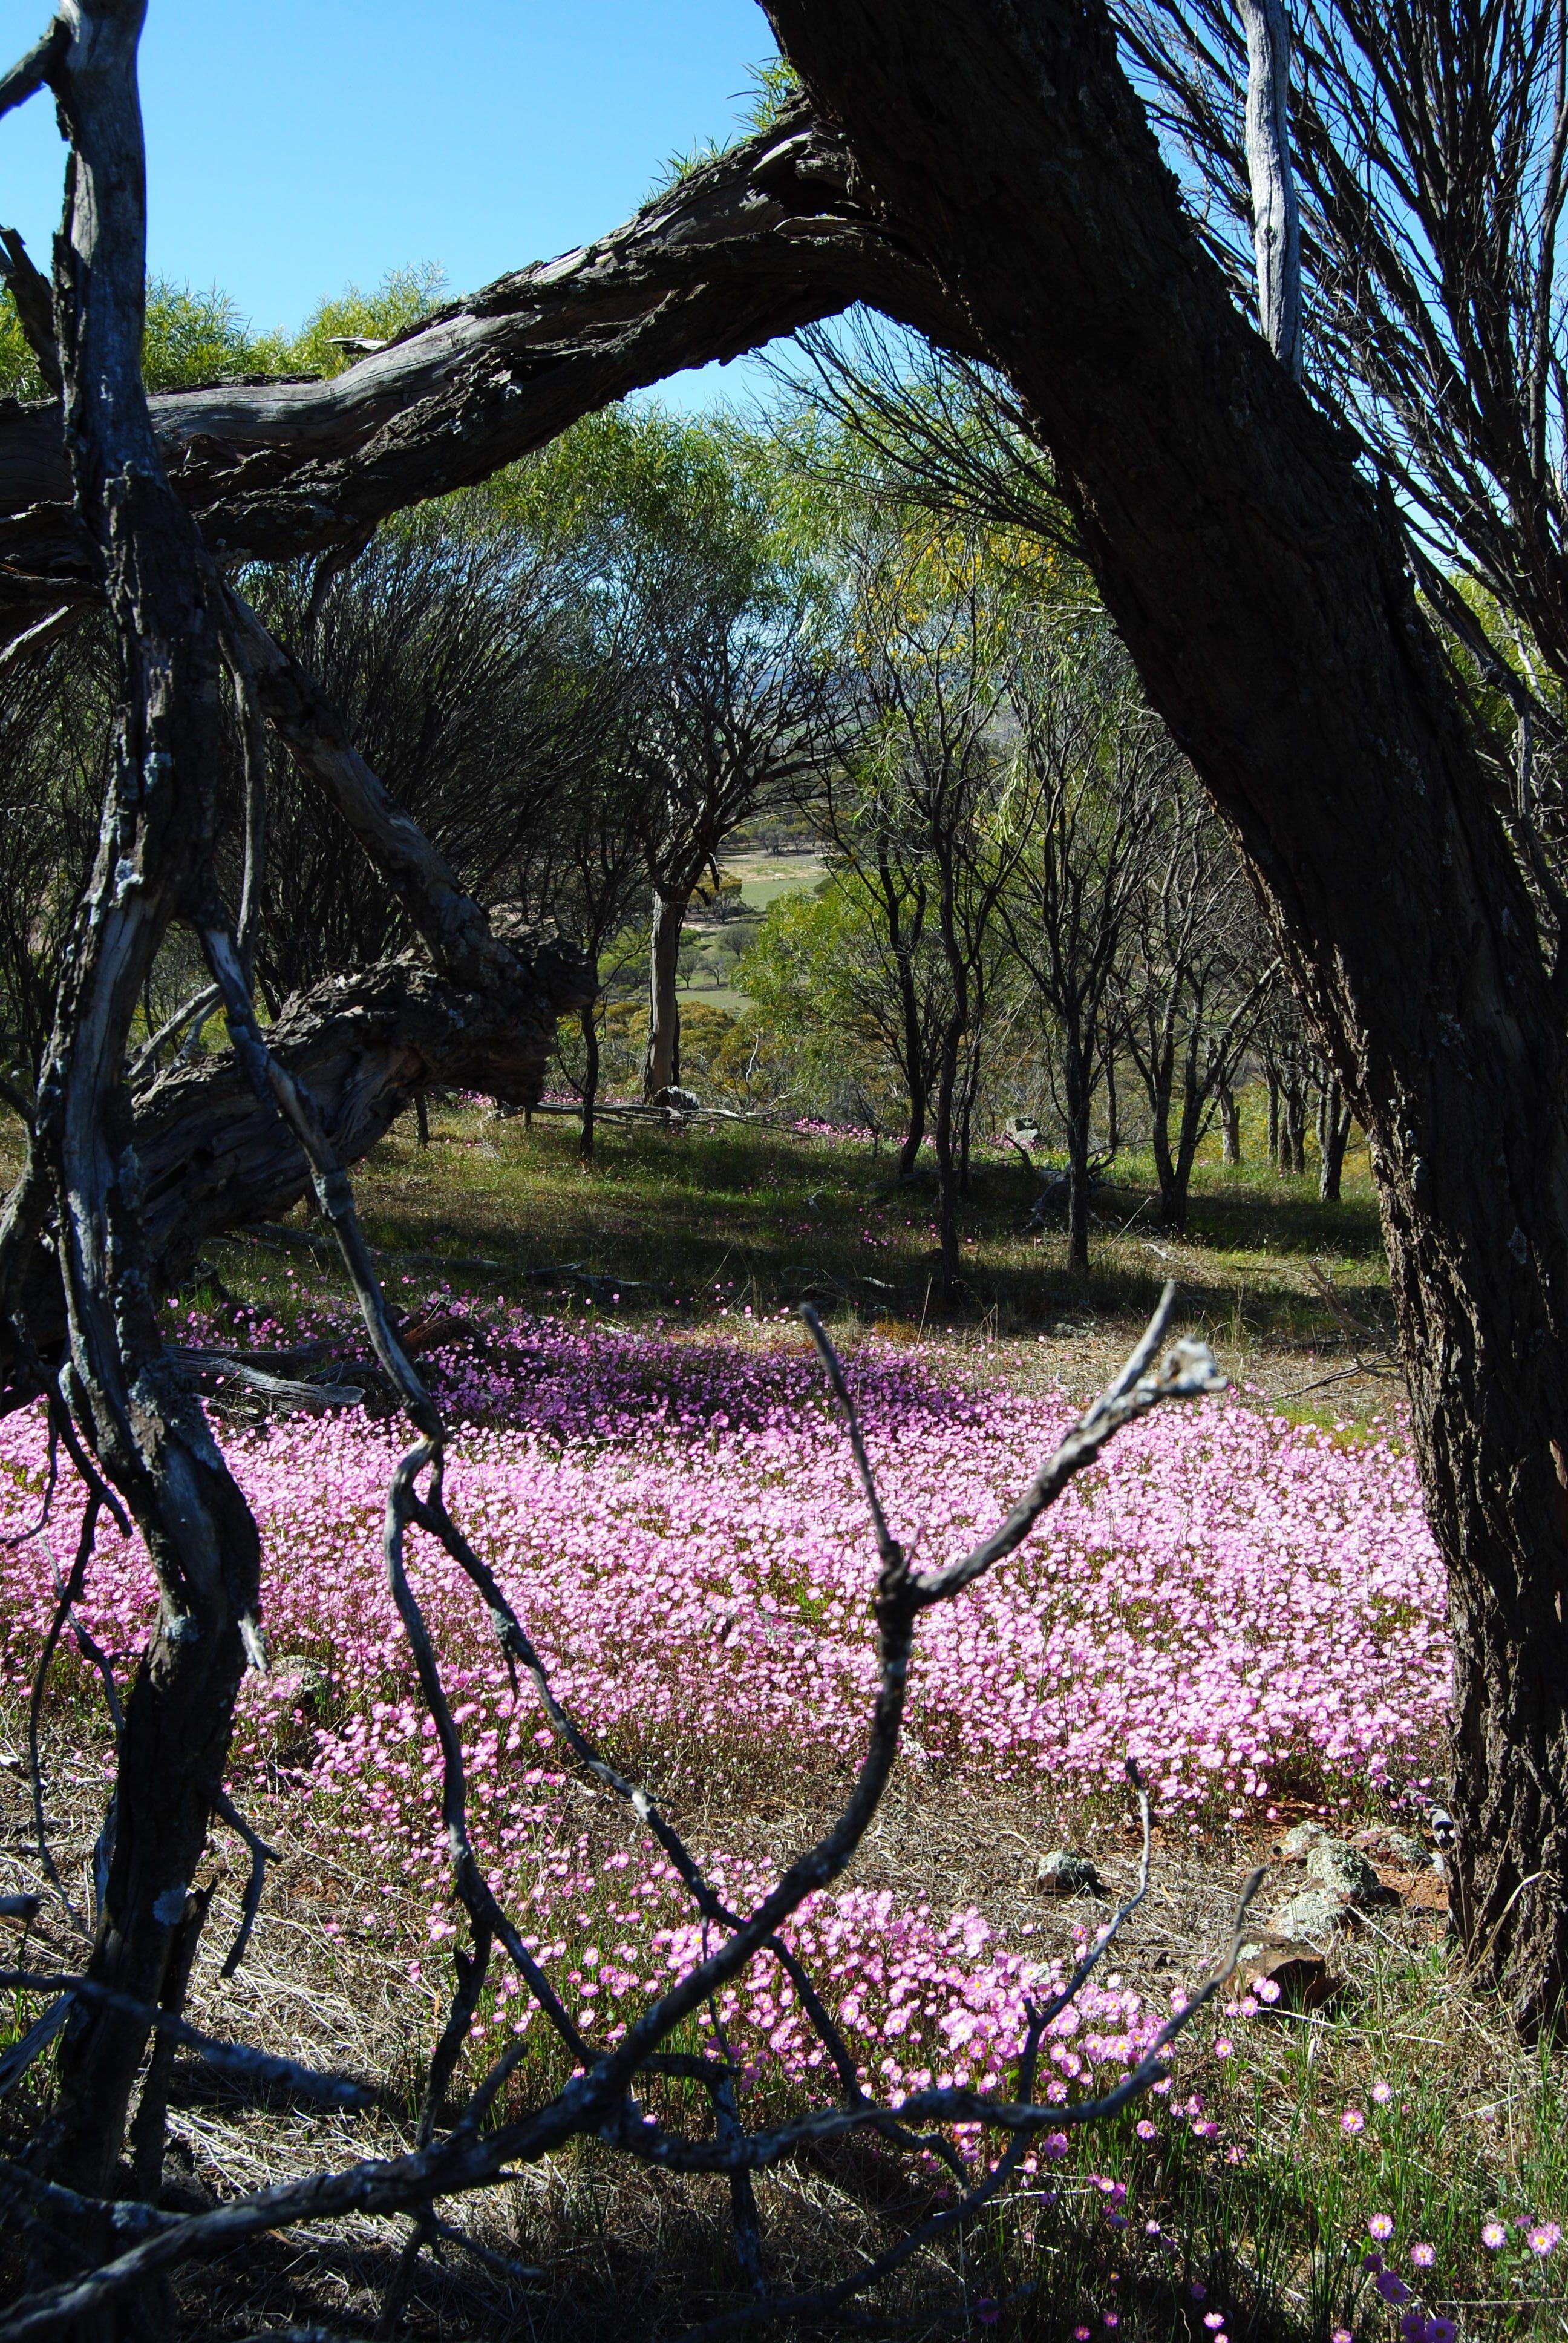 pink everlastings wildflower season wheat belt western australia